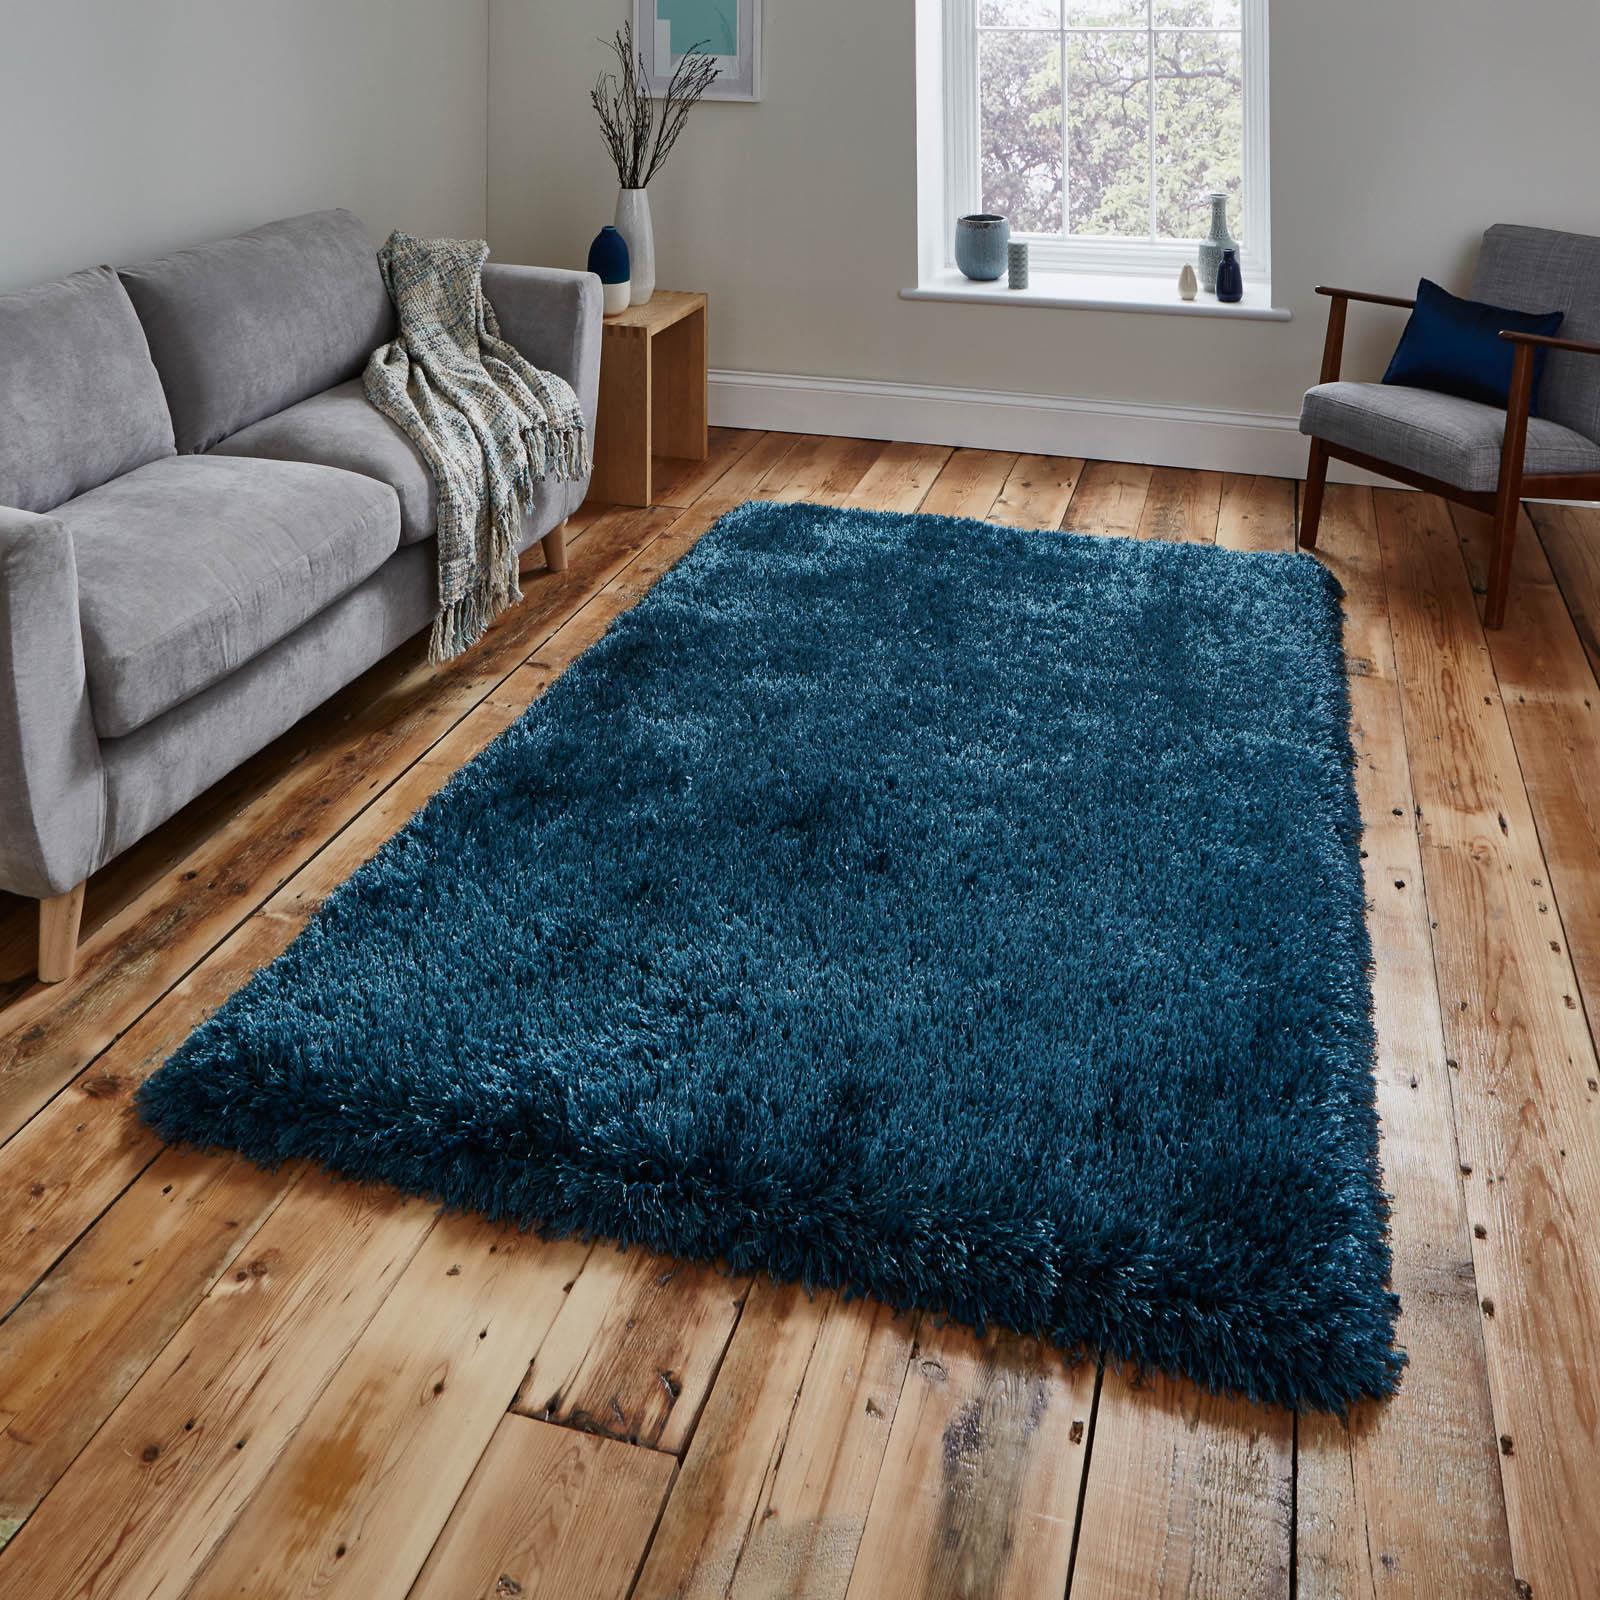 Shaggy carpets montana plcokpr QBAWGBV